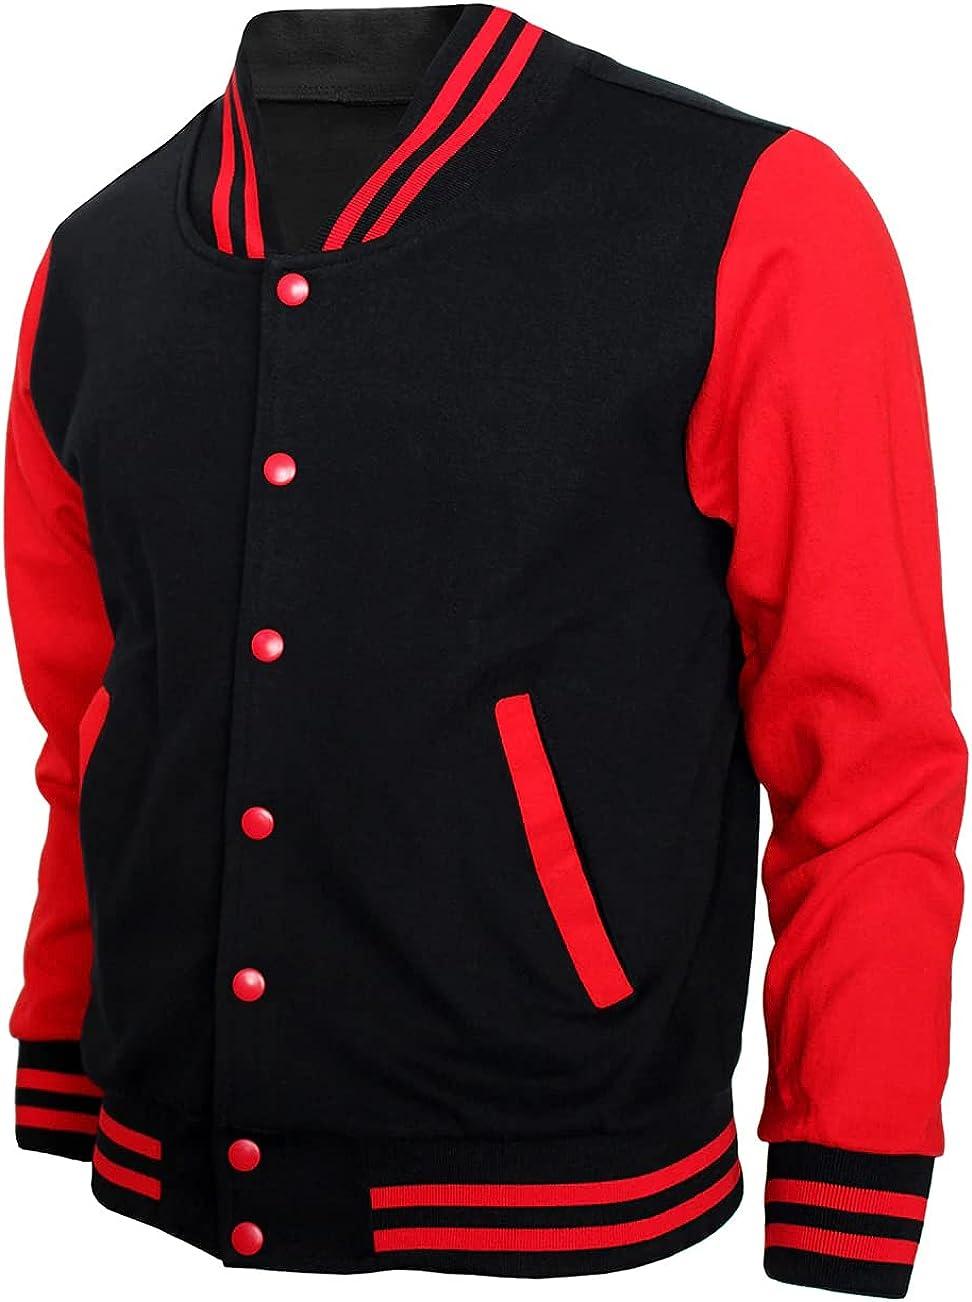 Men's Letterman Baseball Varsity Jacket Fleece Cotton Full Te 8 Ranking TOP11 Max 60% OFF